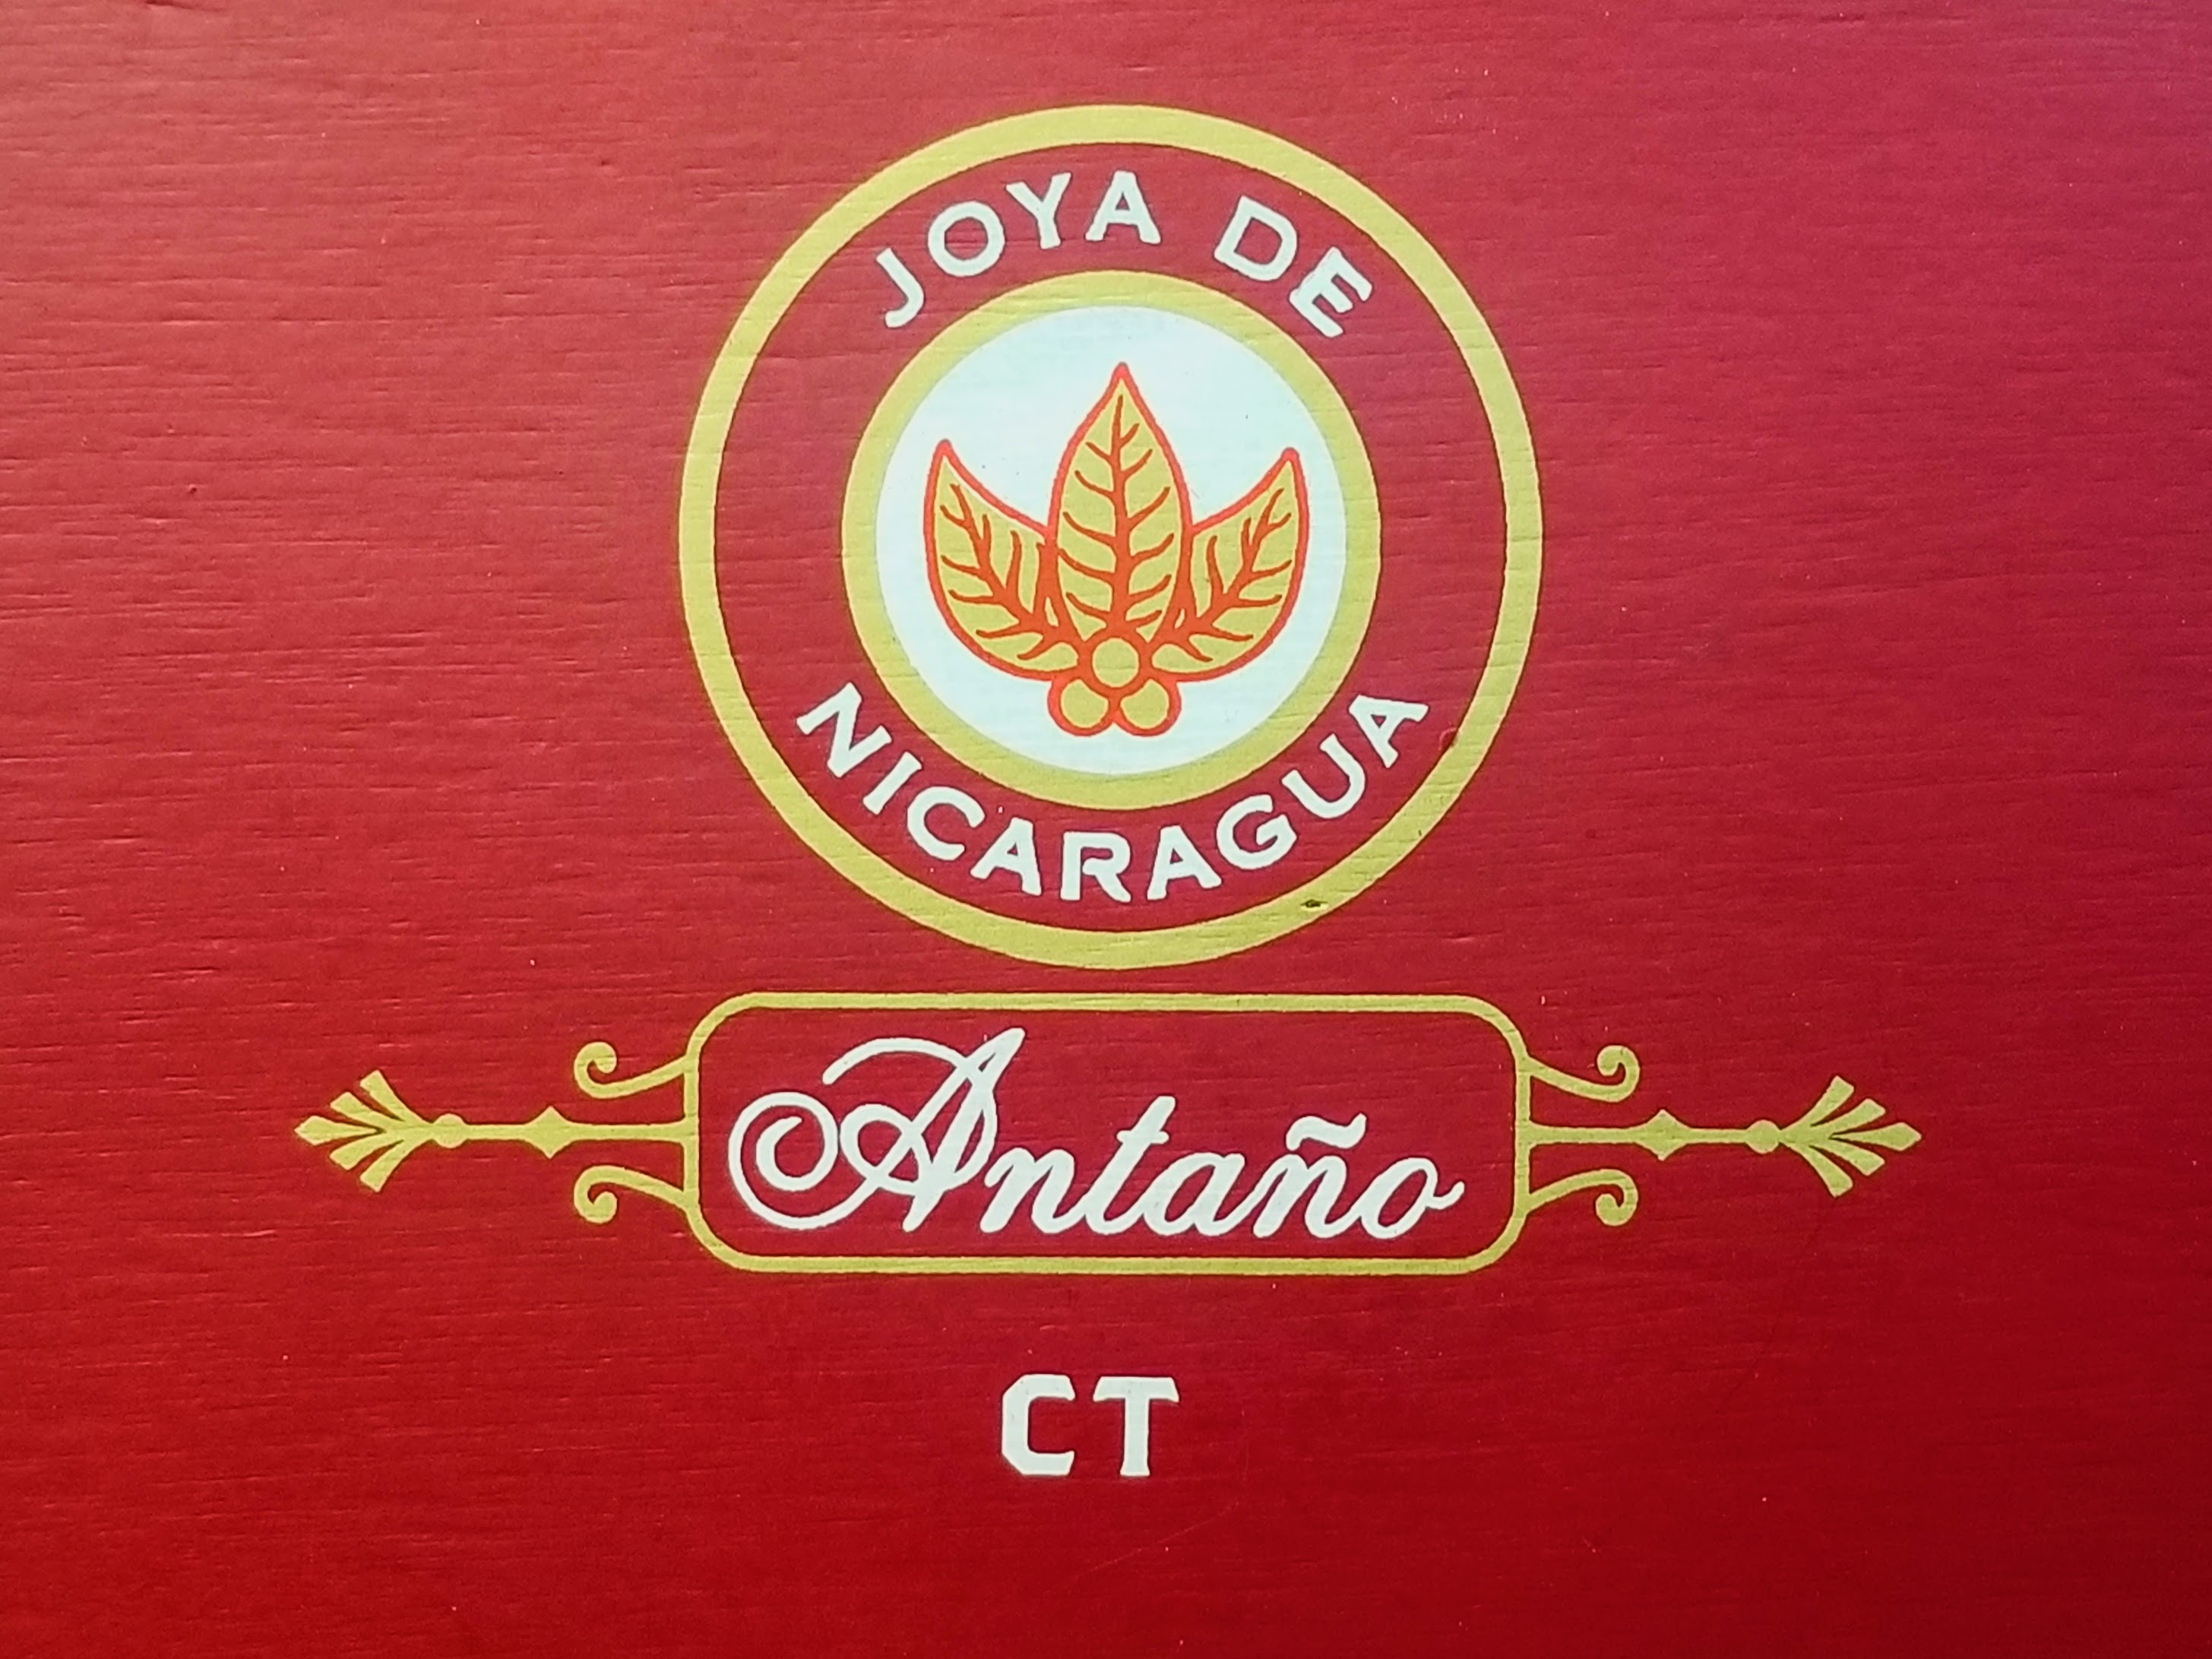 Joya de Nicaragua Antaño CT box art